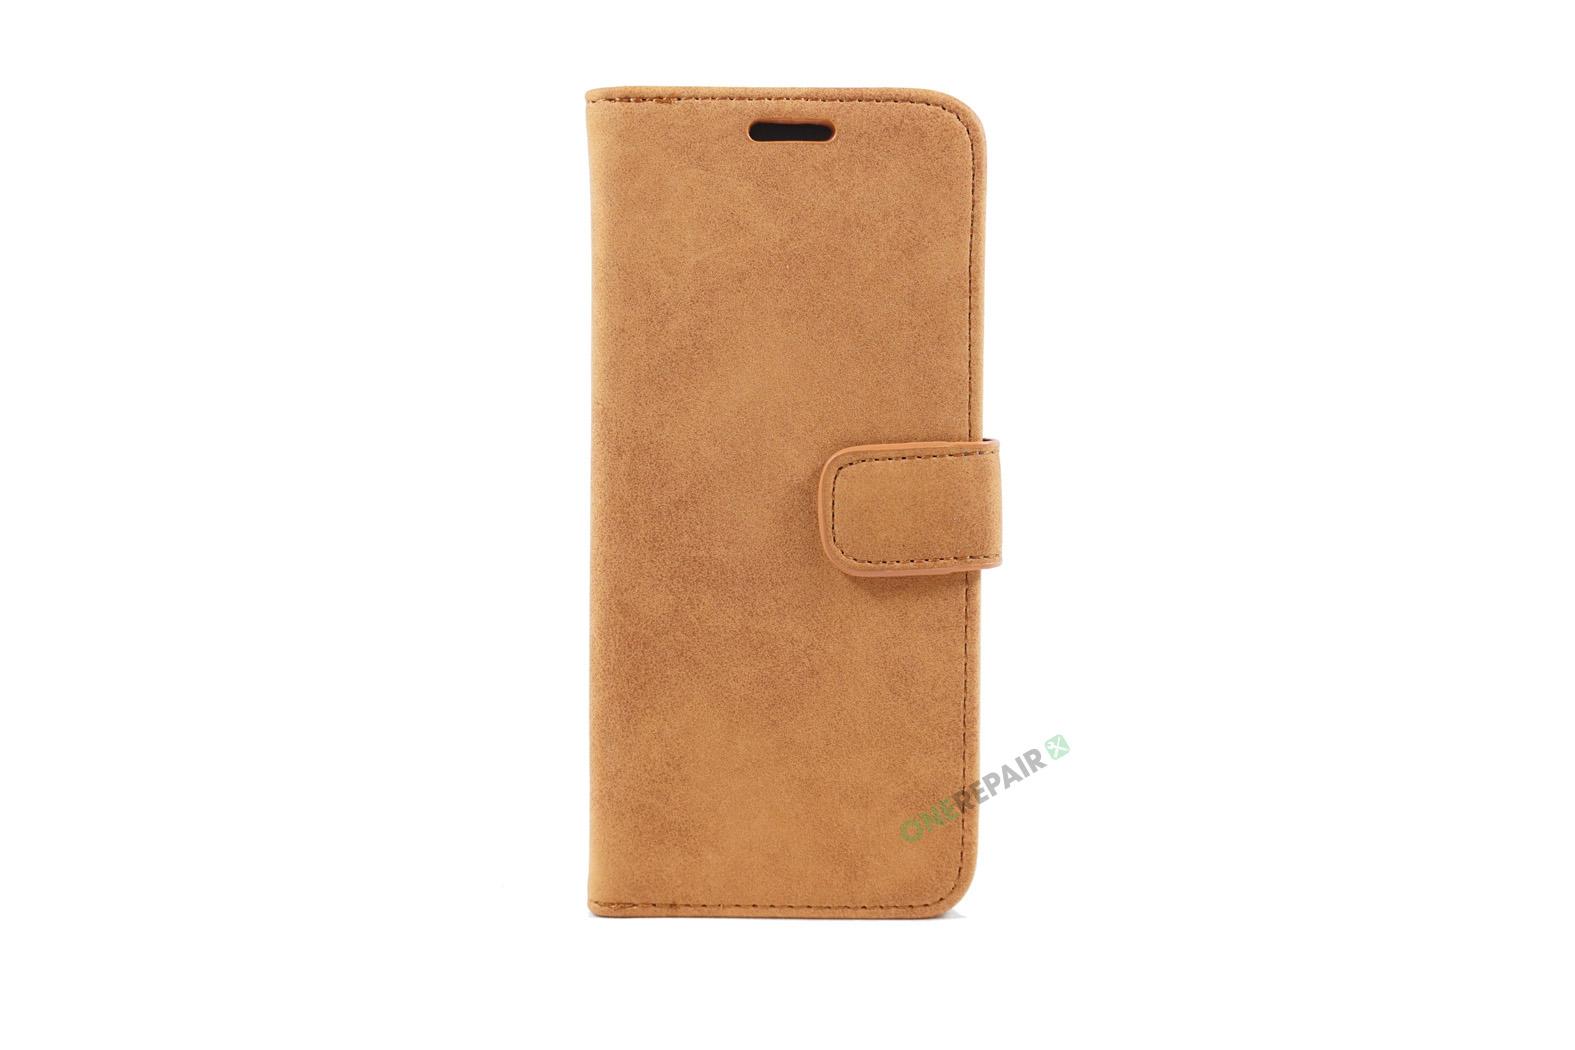 350701_Samsung_S8+_Flipcover_Rustik_Cover_Lys_Brun_OneRepair_00001